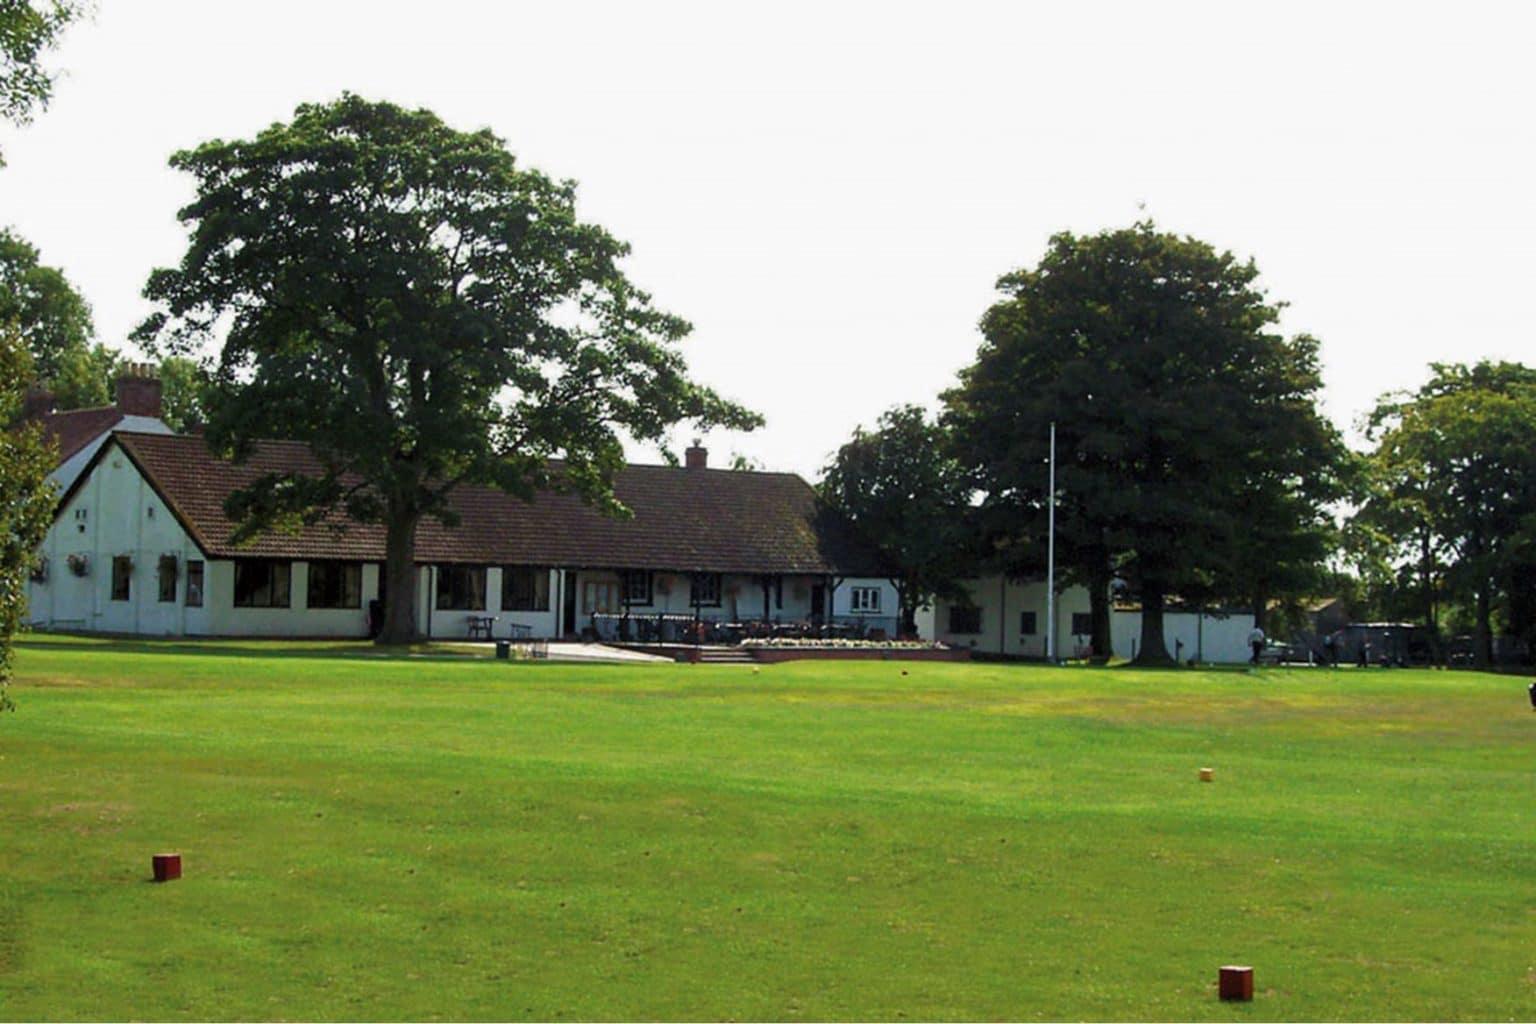 The Darlington Golf Club